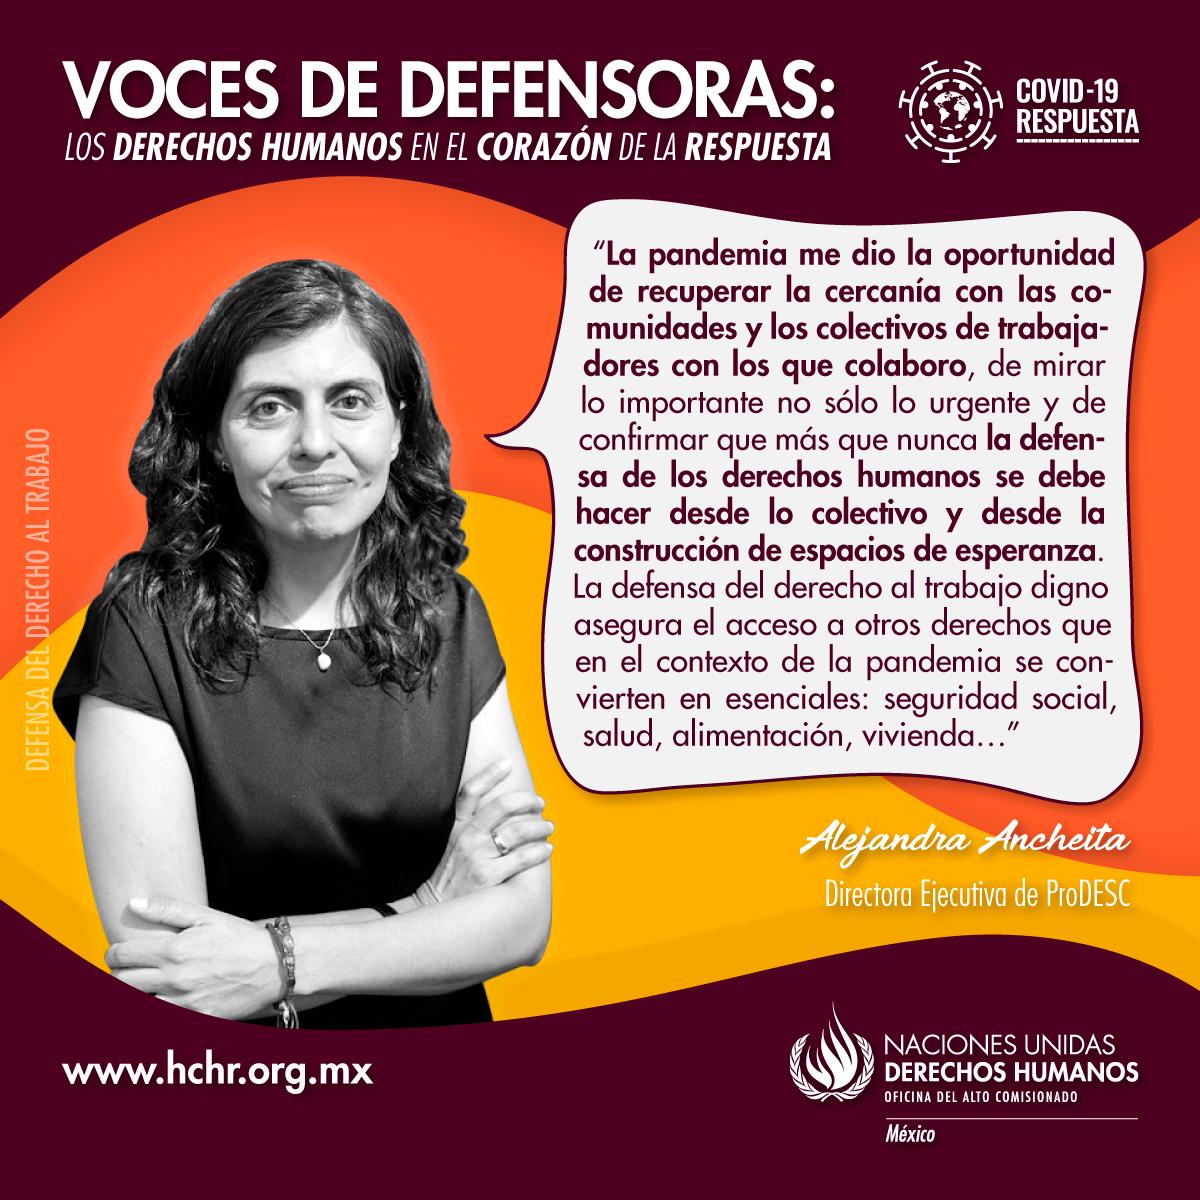 VocesDefensoras_COVID_Alejandra